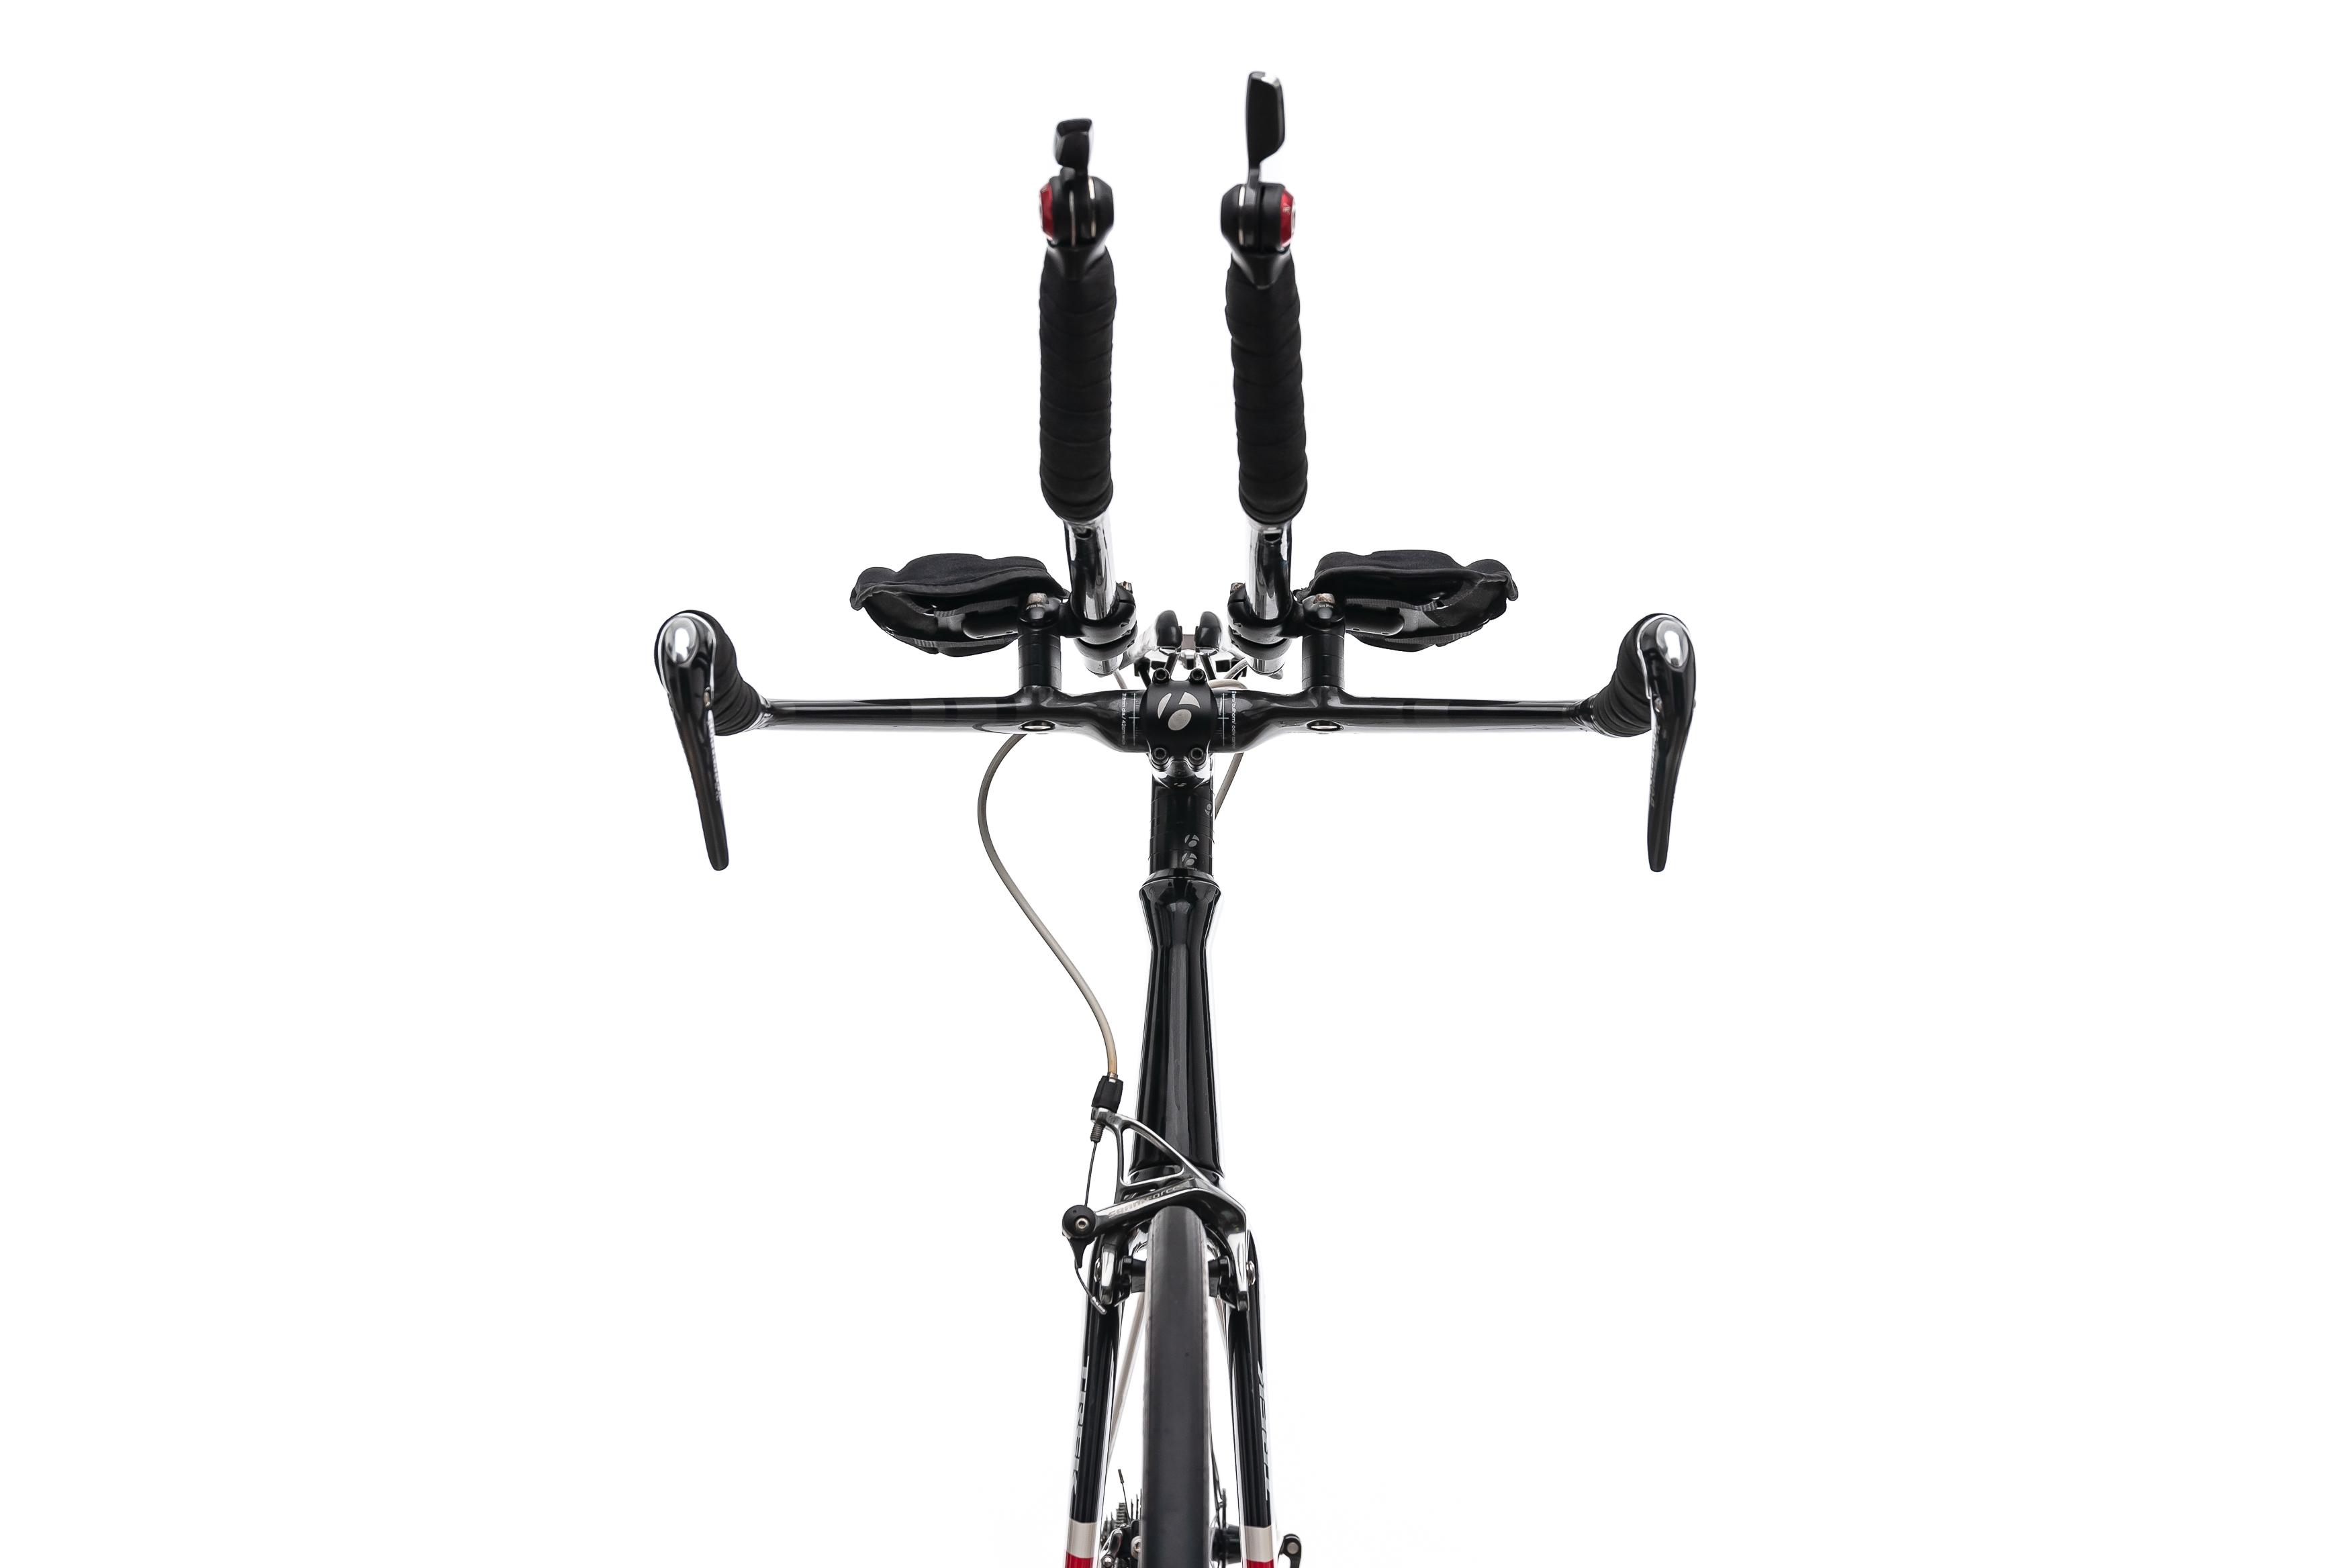 2013-Trek-Speed-Concept-7-Series-Time-Trial-Bike-XL-Carbon-SRAM-Force-Rolf miniature 6